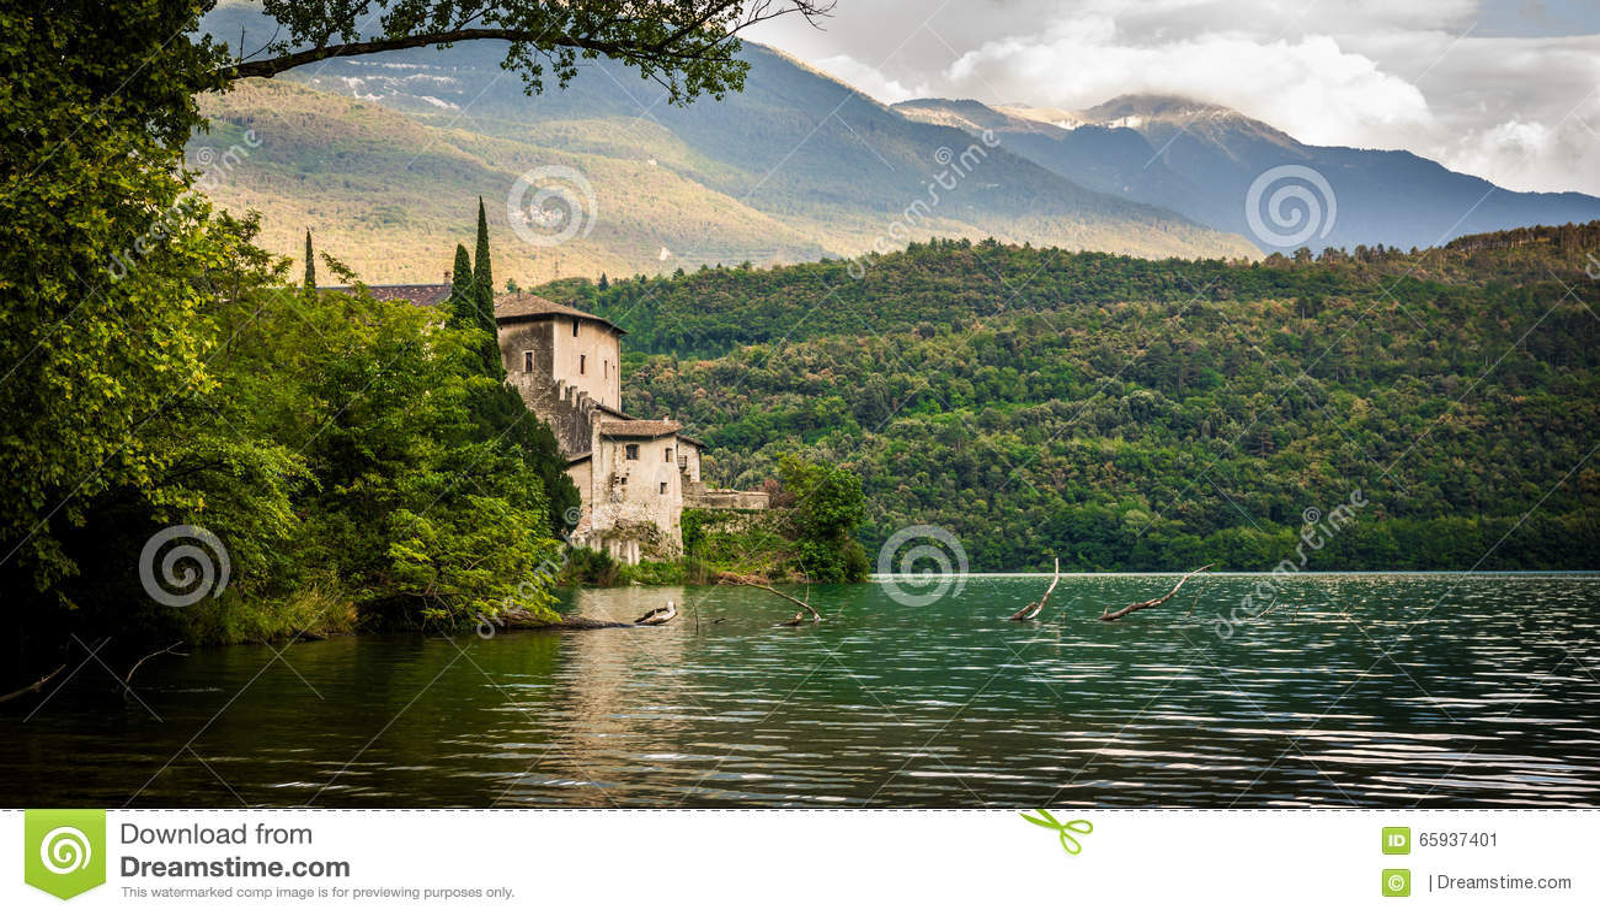 Italian lake house stock image image of trees background for Lake house in italian